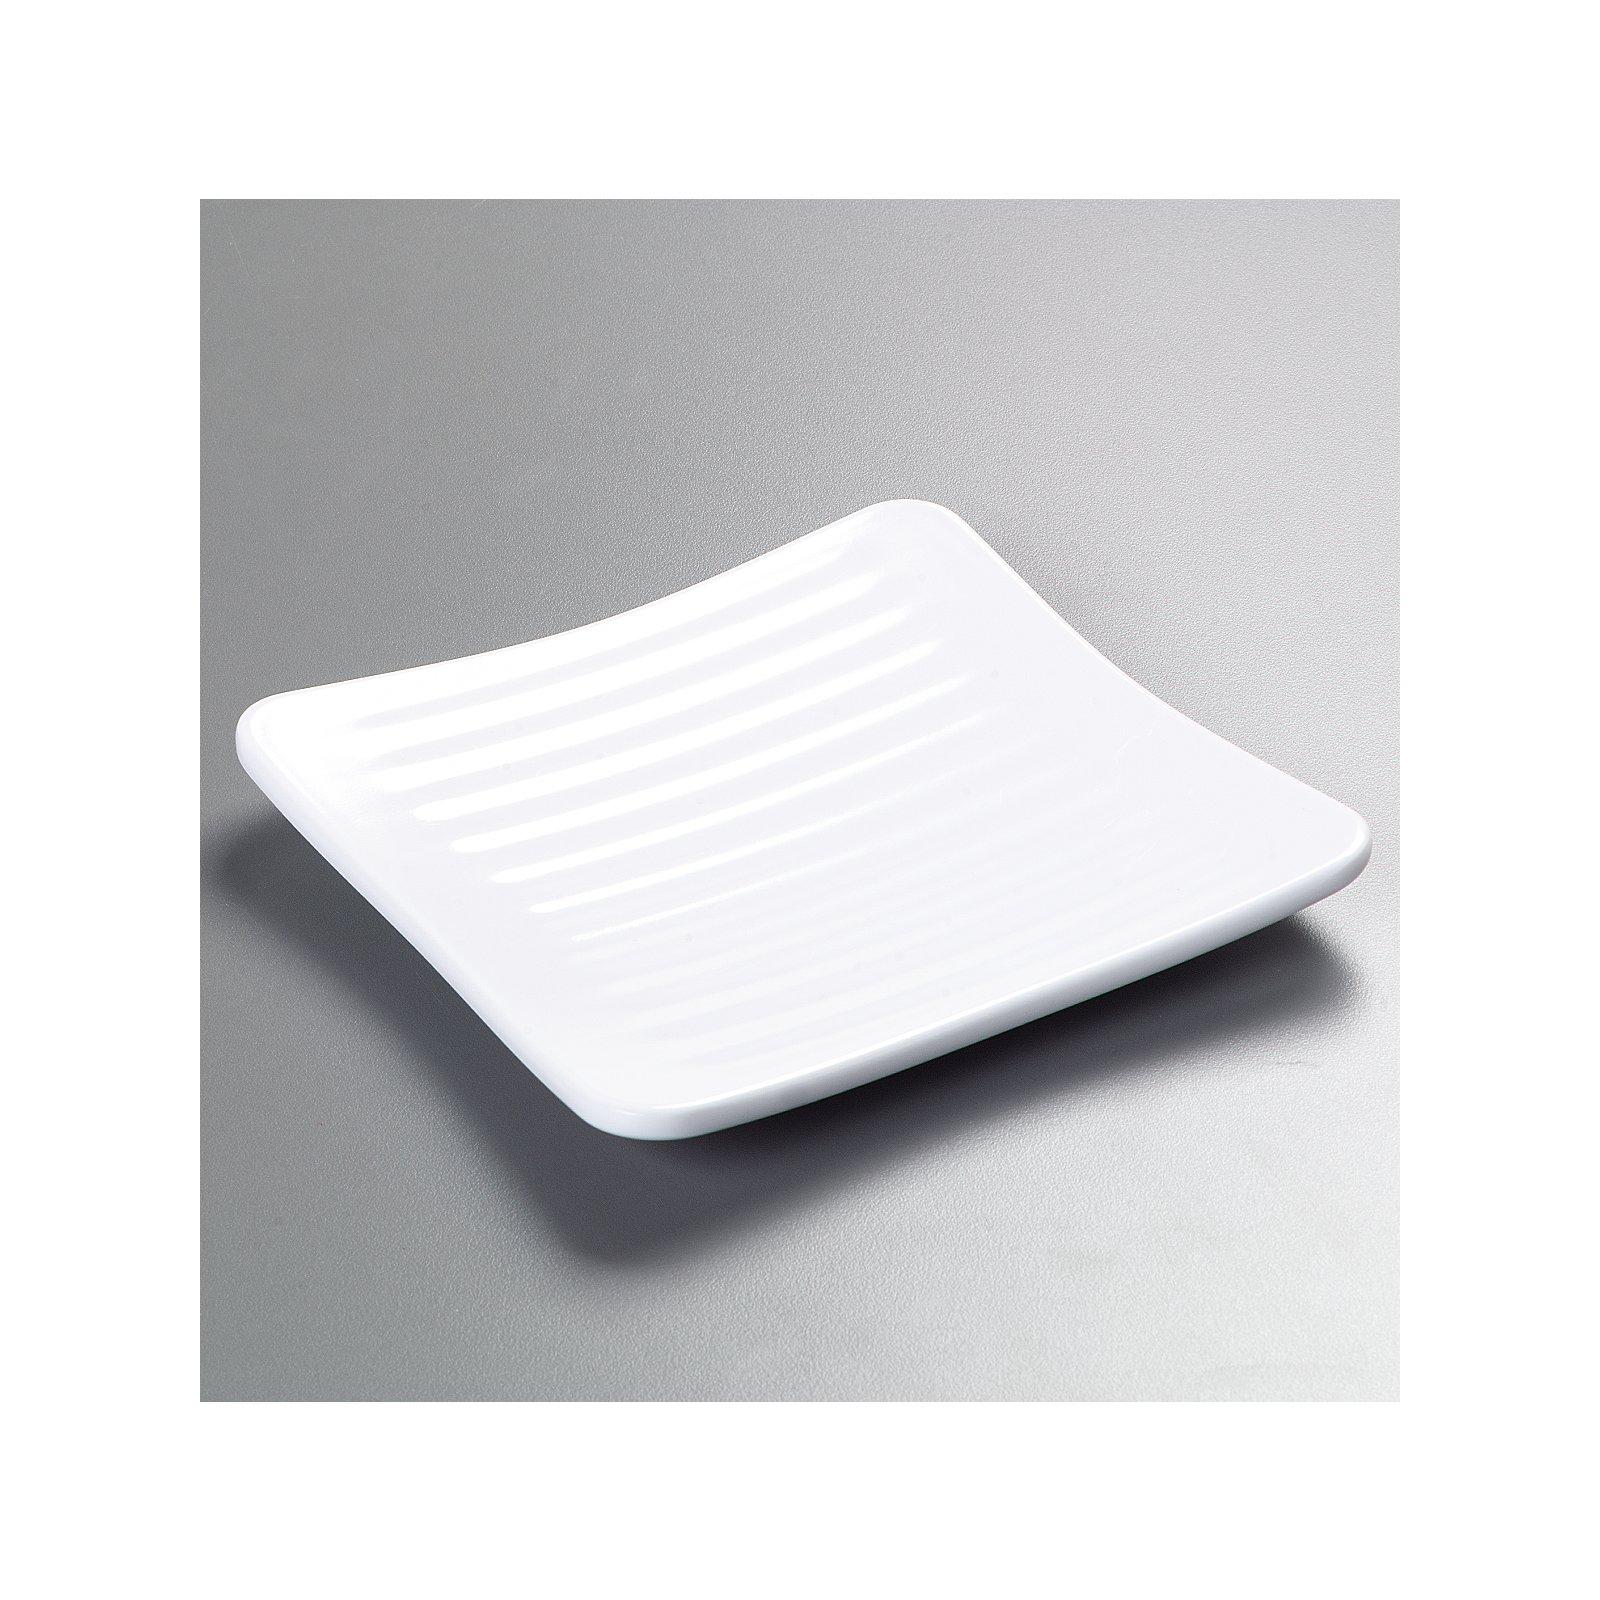 ... 4382202 - Epicure® Melamine Square Plate 6.25\  - White  sc 1 st  Carlisle FoodService Products & 4382202 - Epicure® Melamine Square Plate 6.25\